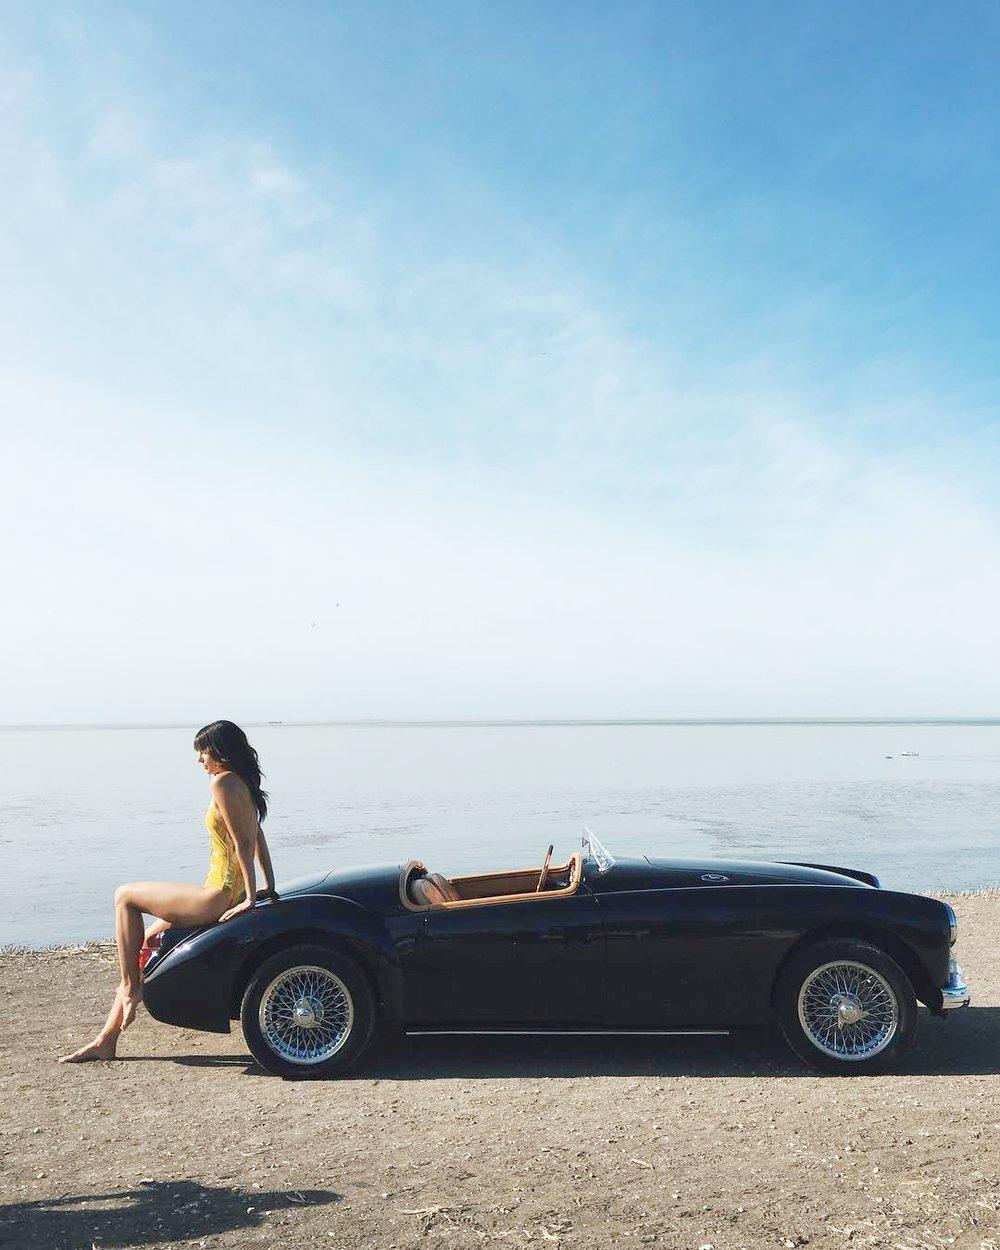 vinty classic car hire service. Black Bedroom Furniture Sets. Home Design Ideas